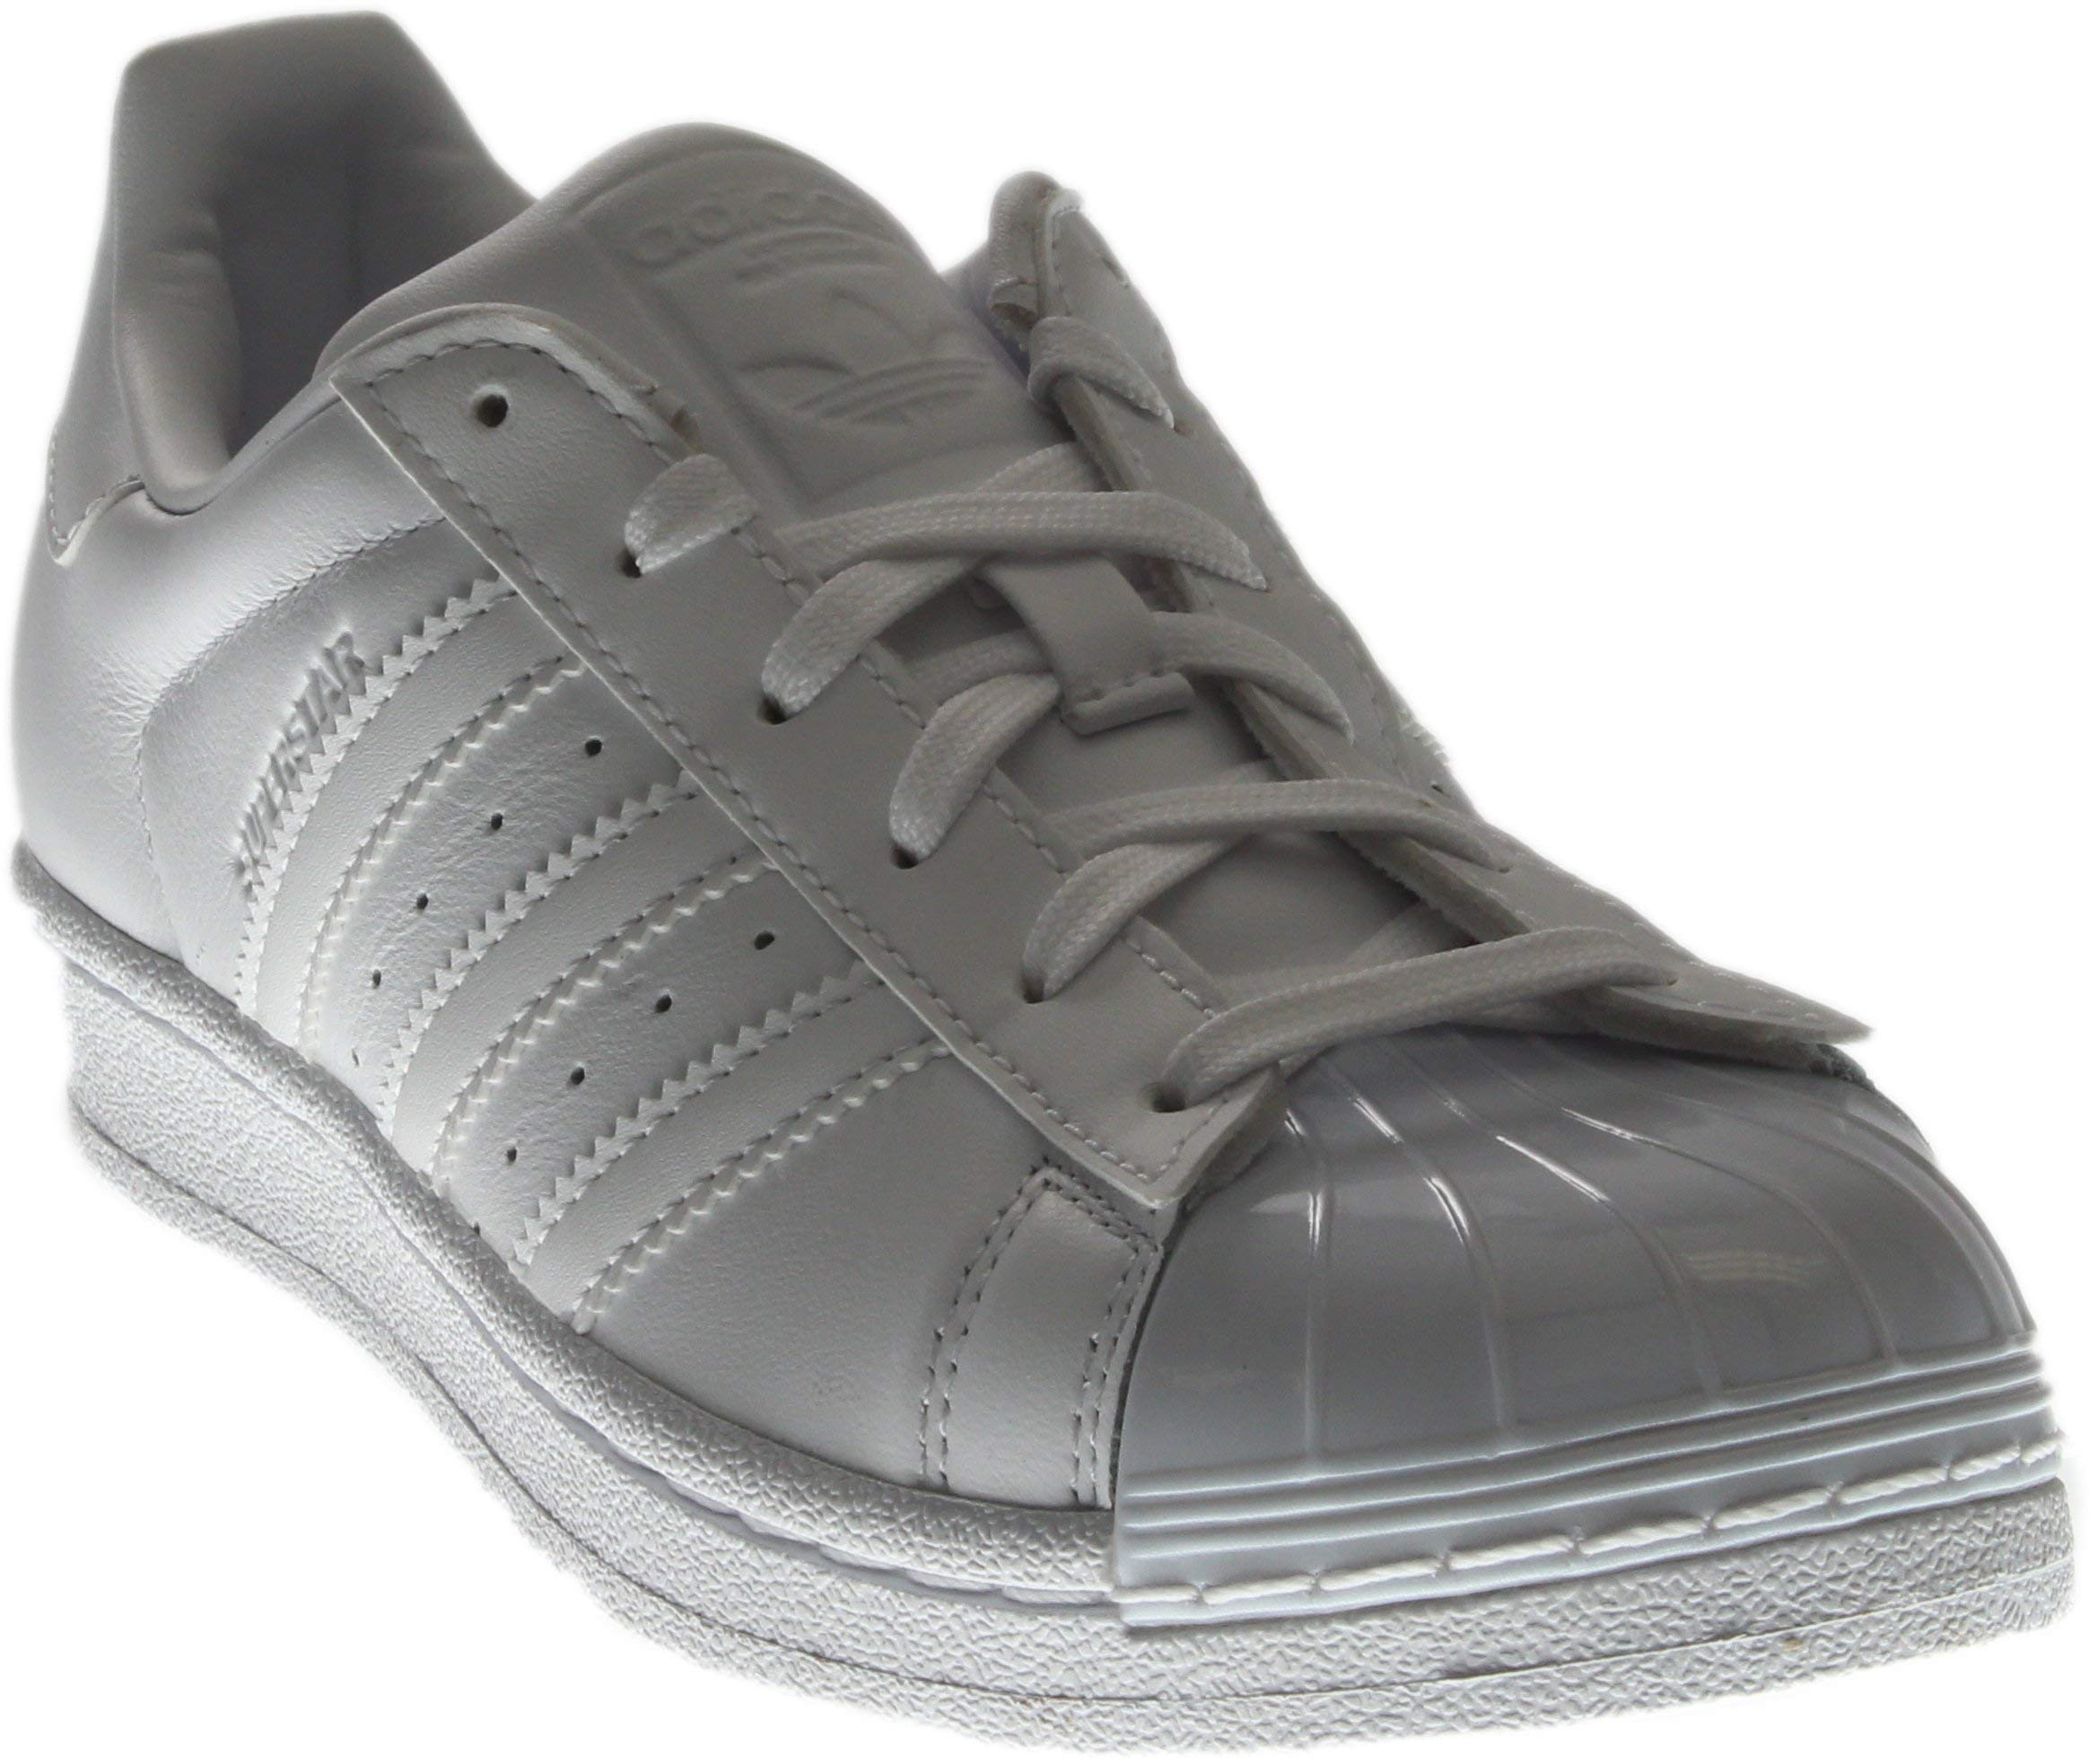 huge discount 0dfb3 e9446 Galleon - Adidas Originals Women's Superstar Glossy Toe Fashion Running  Shoe White/Black, ((8 M US)